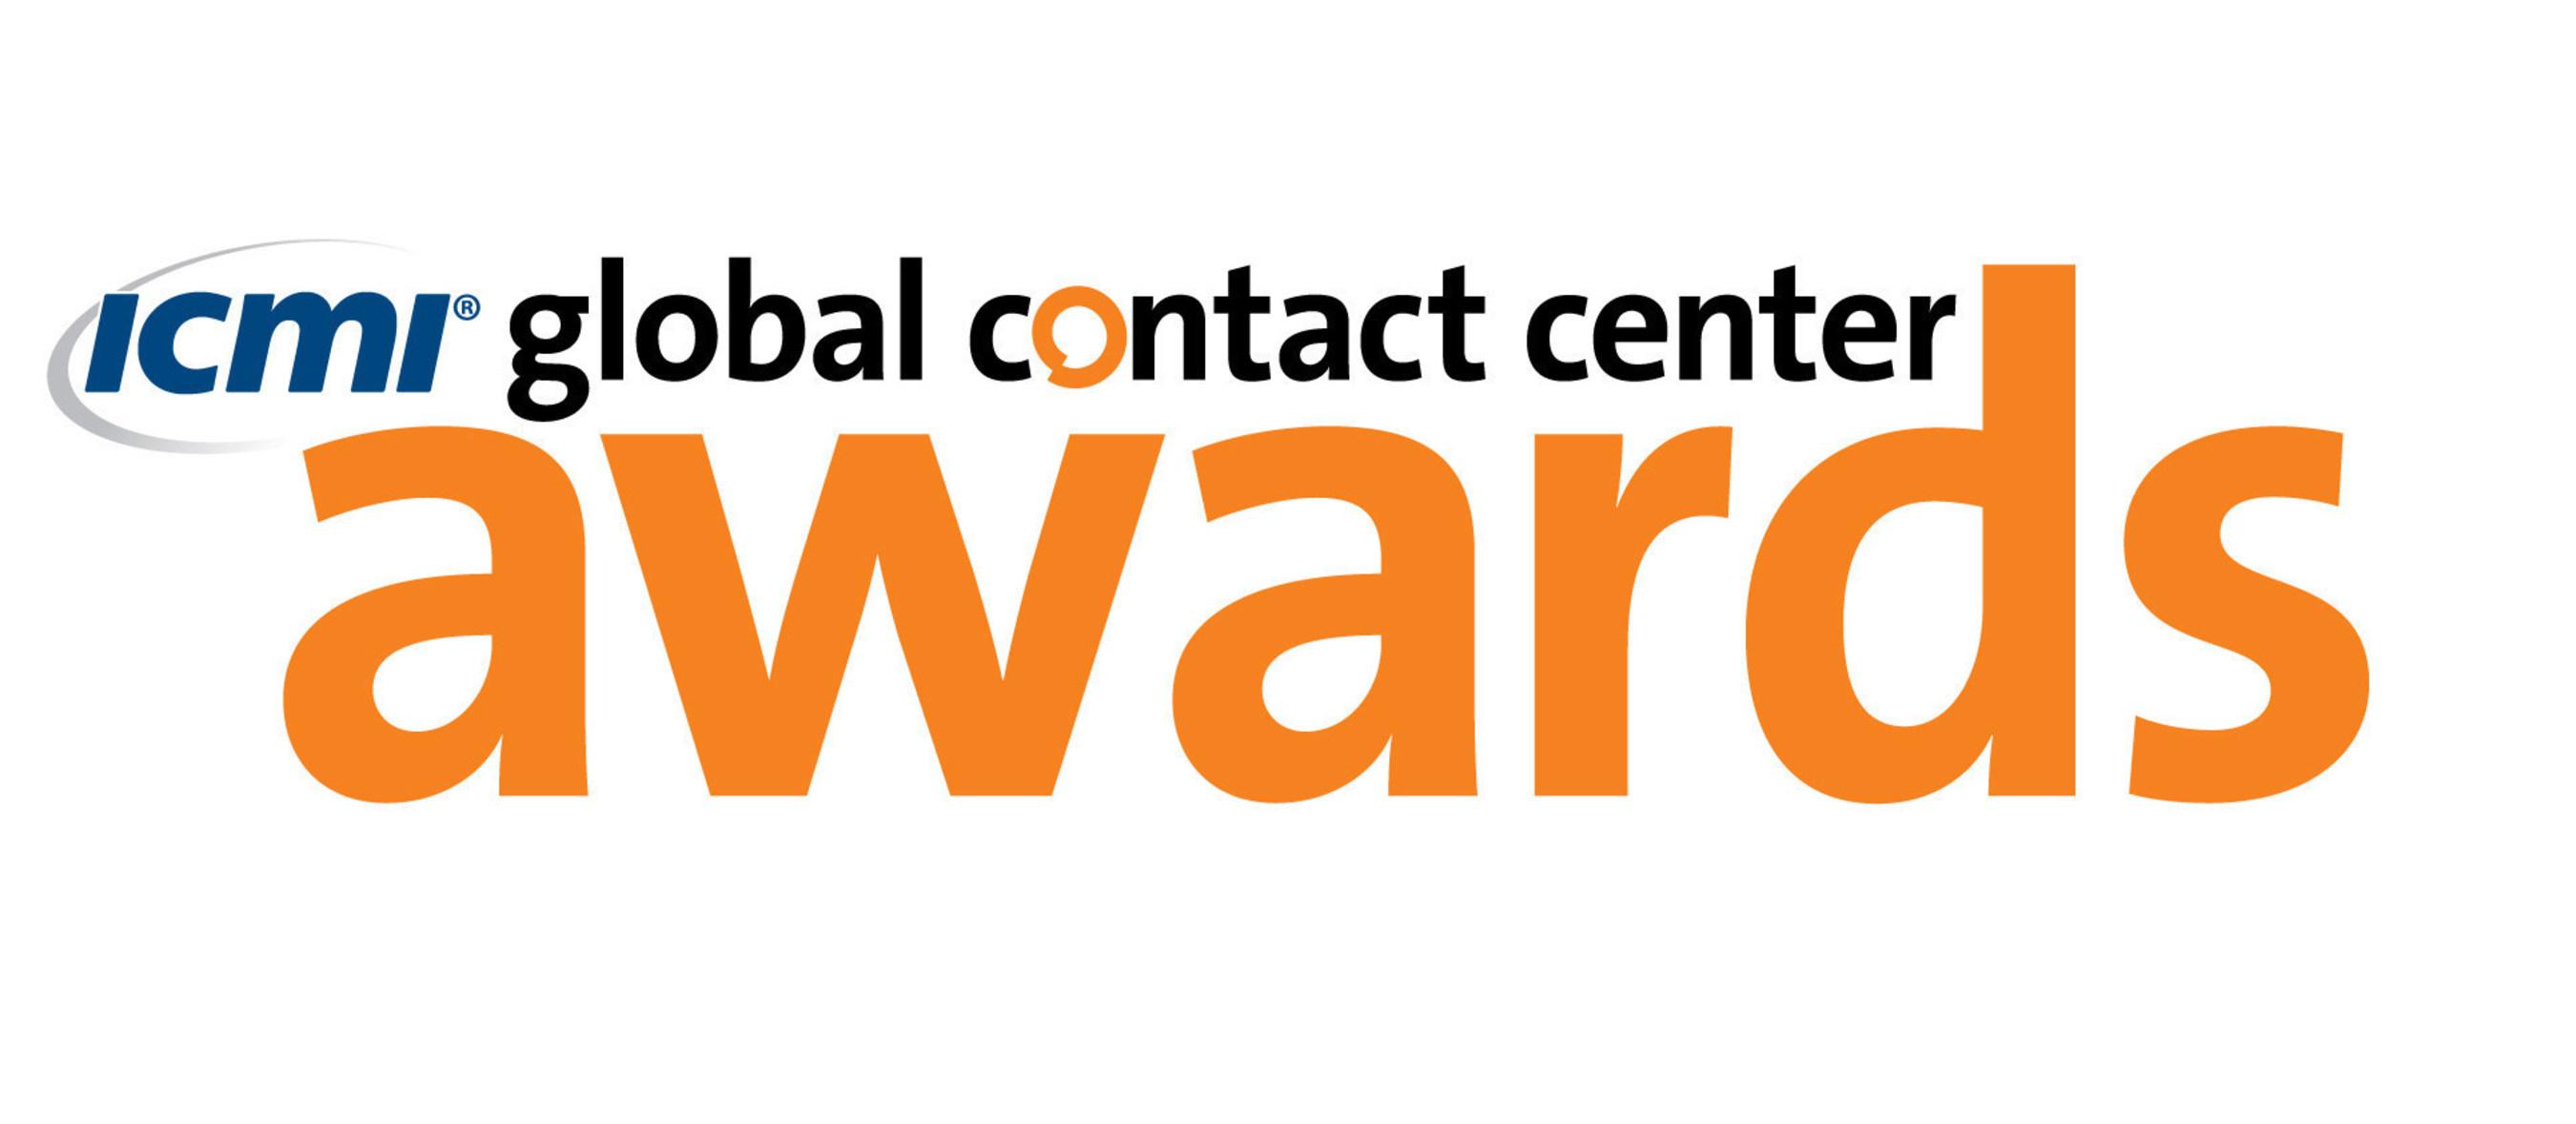 ICMI announces 2015 Global Contact Center Award winners